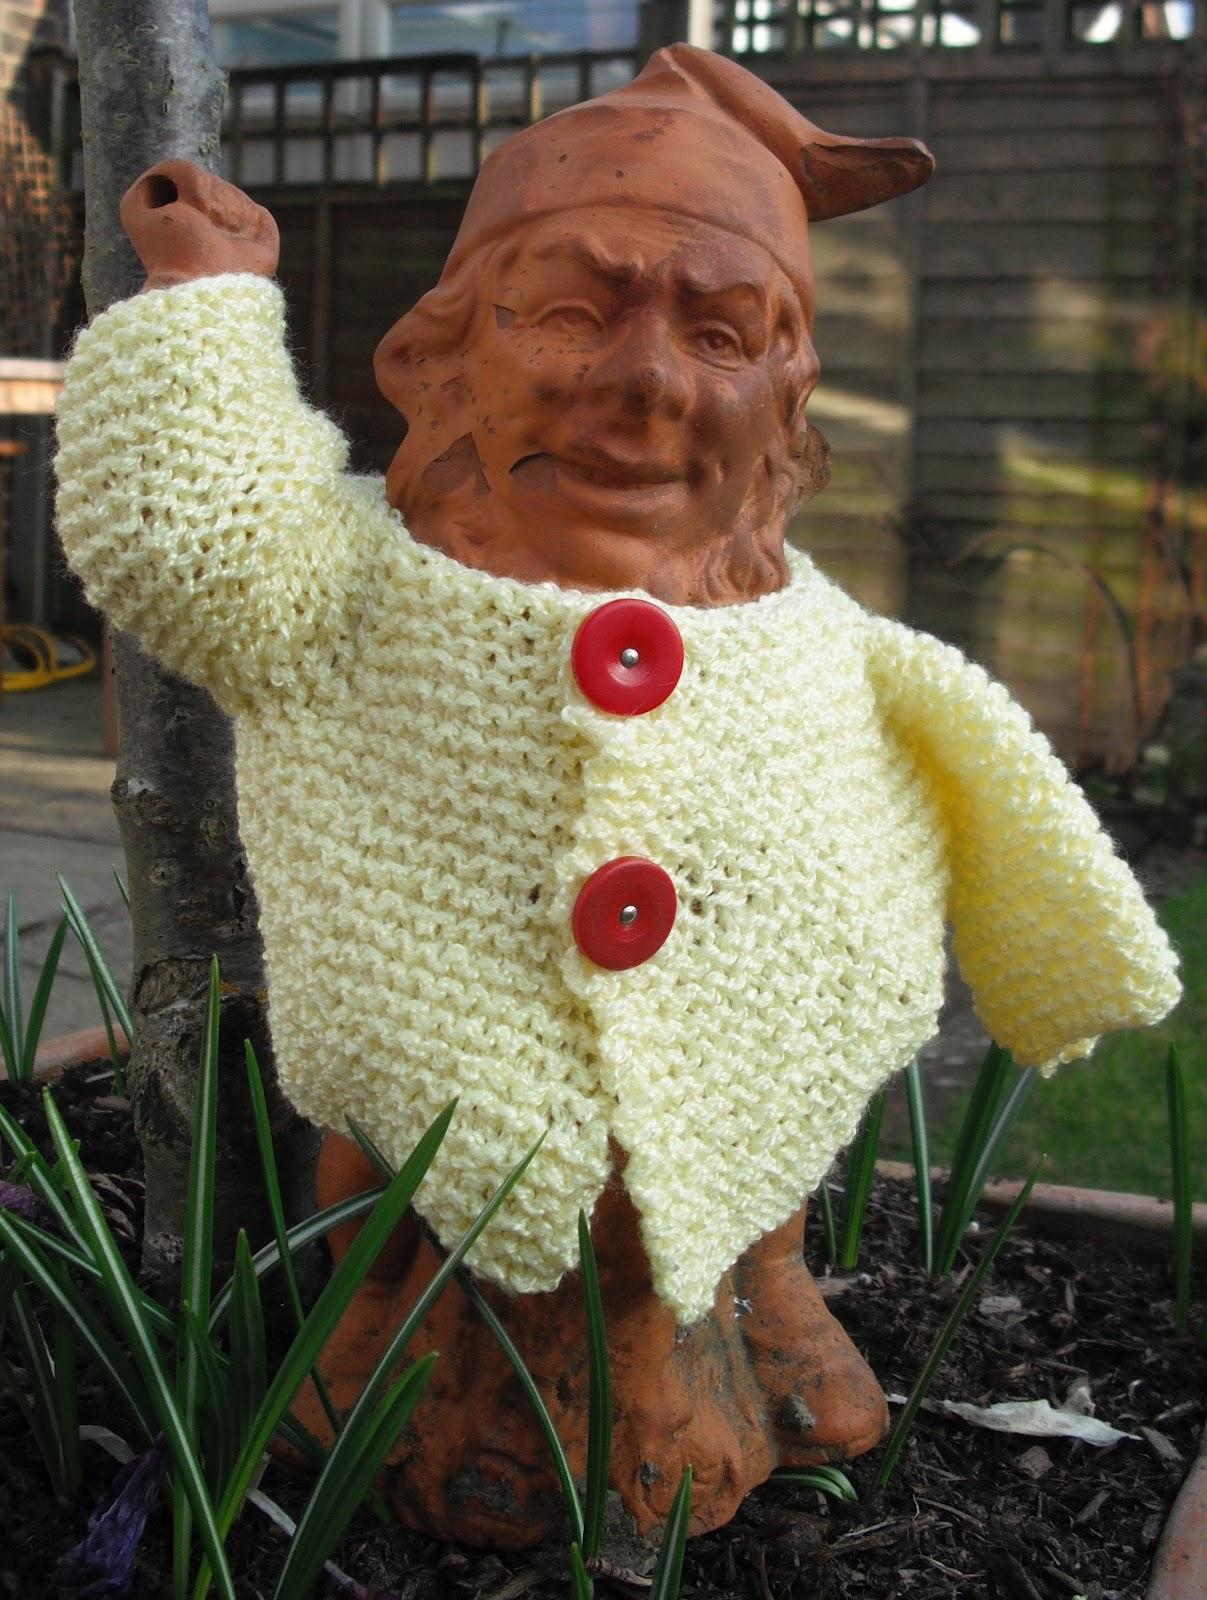 Gnome Knitting Pattern : bitstobuy: Free knitting pattern for a garden gnome jacket